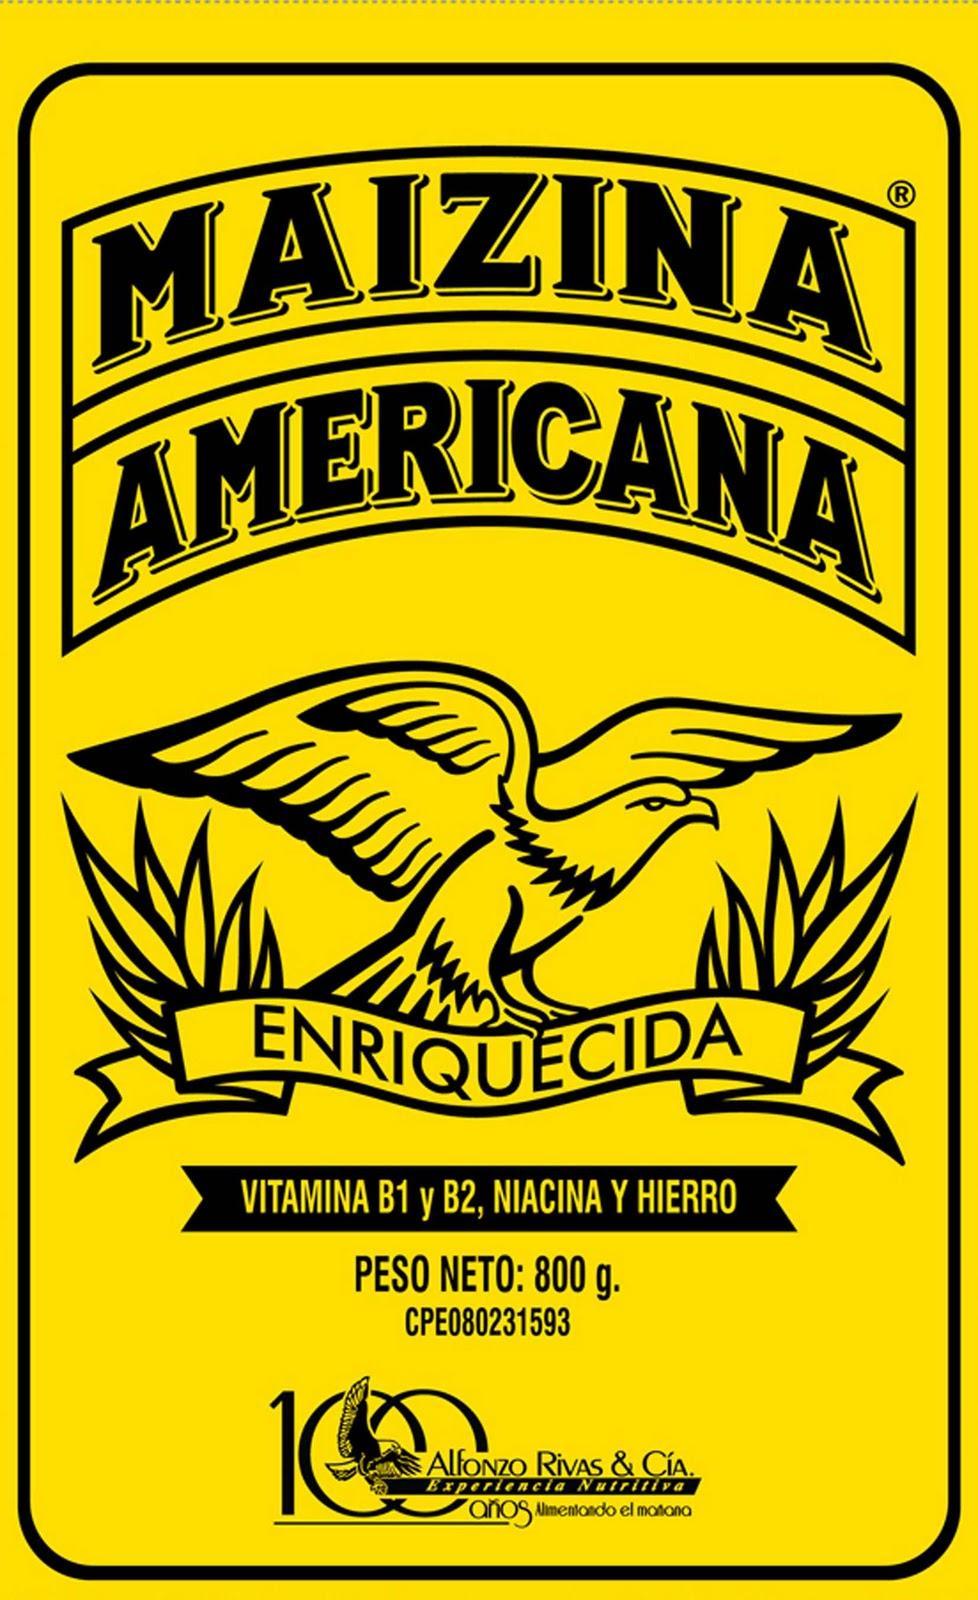 Maizina+Americana-2009.jpg (978×1600)